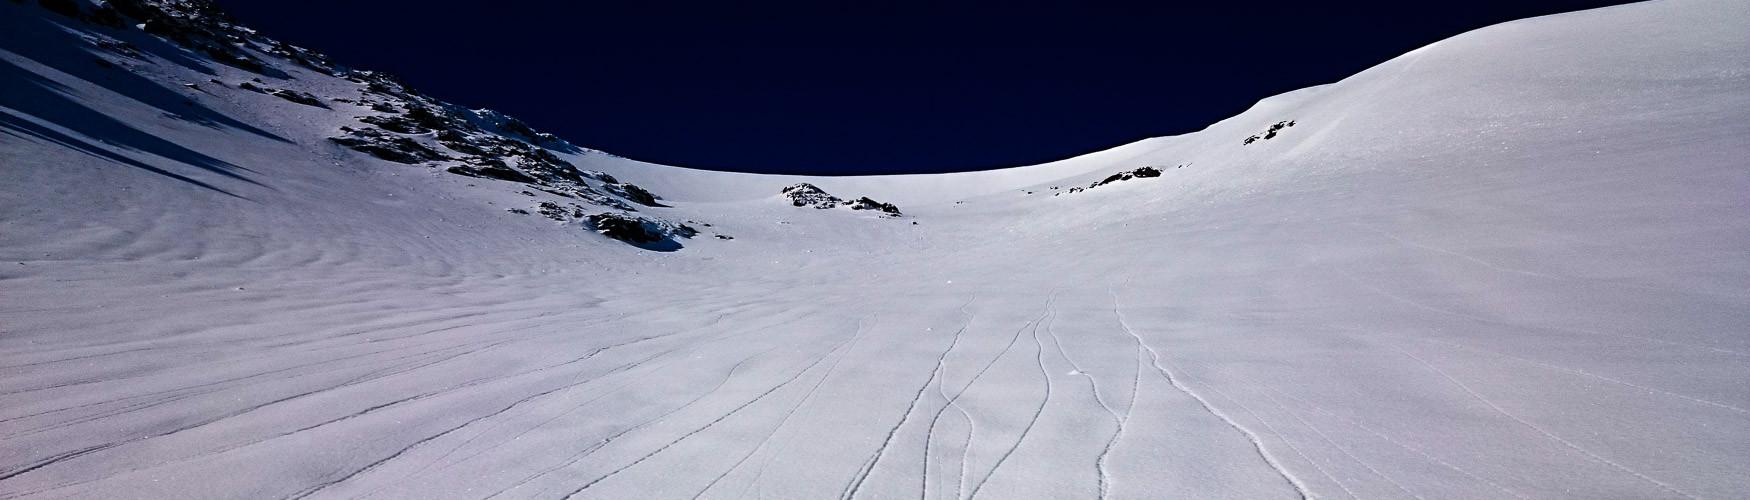 Chile Skireise, Skitouren Chile